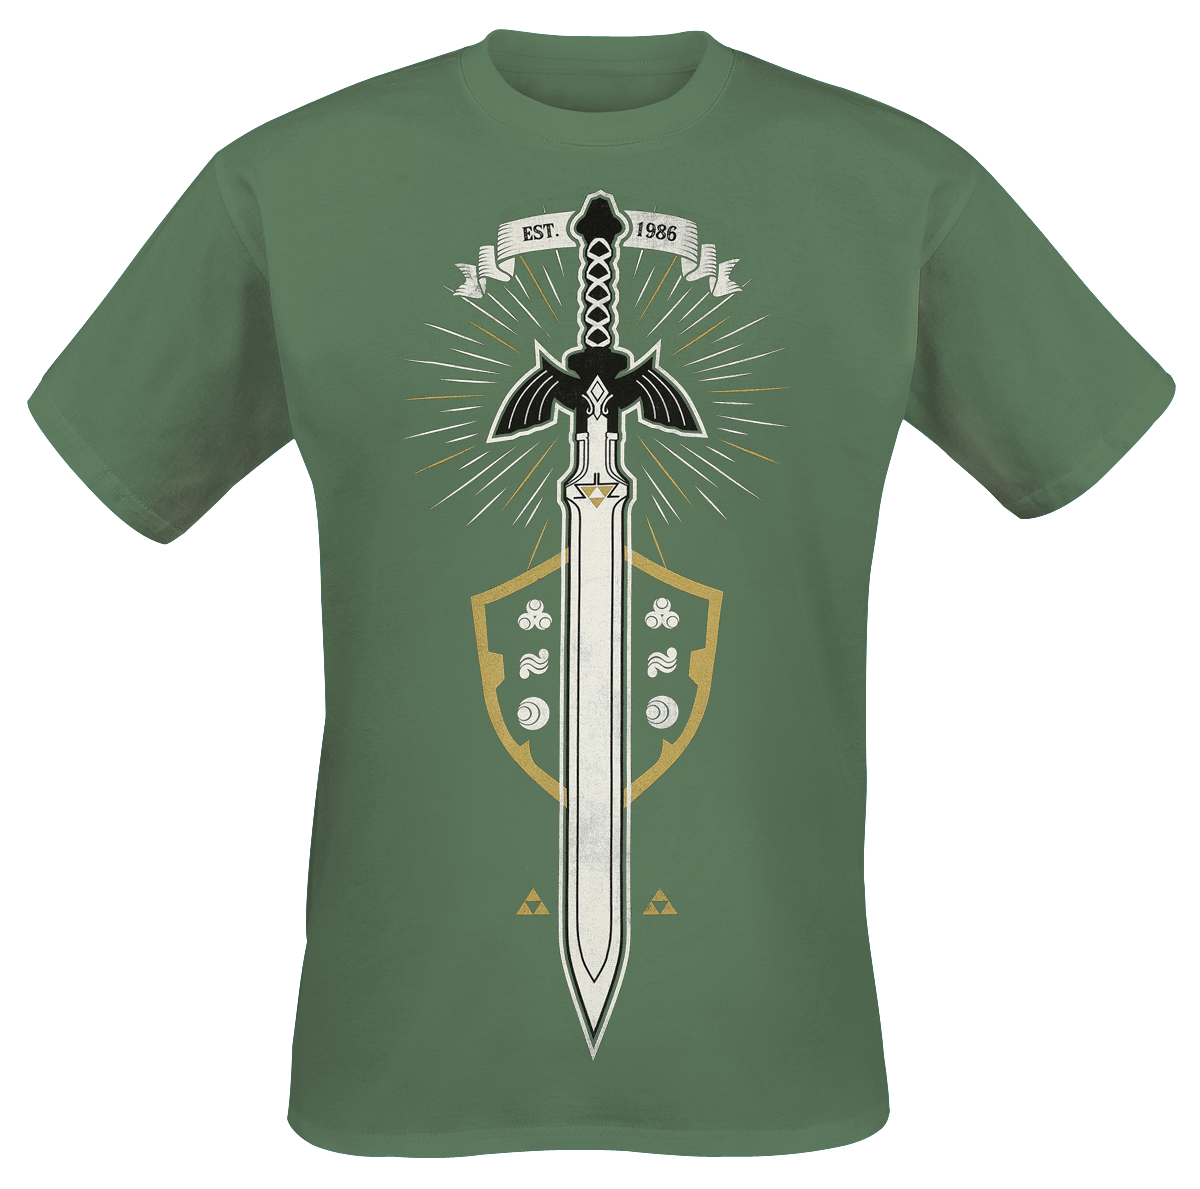 The Legend Of Zelda - The Master Sword - T-Shirt - green image